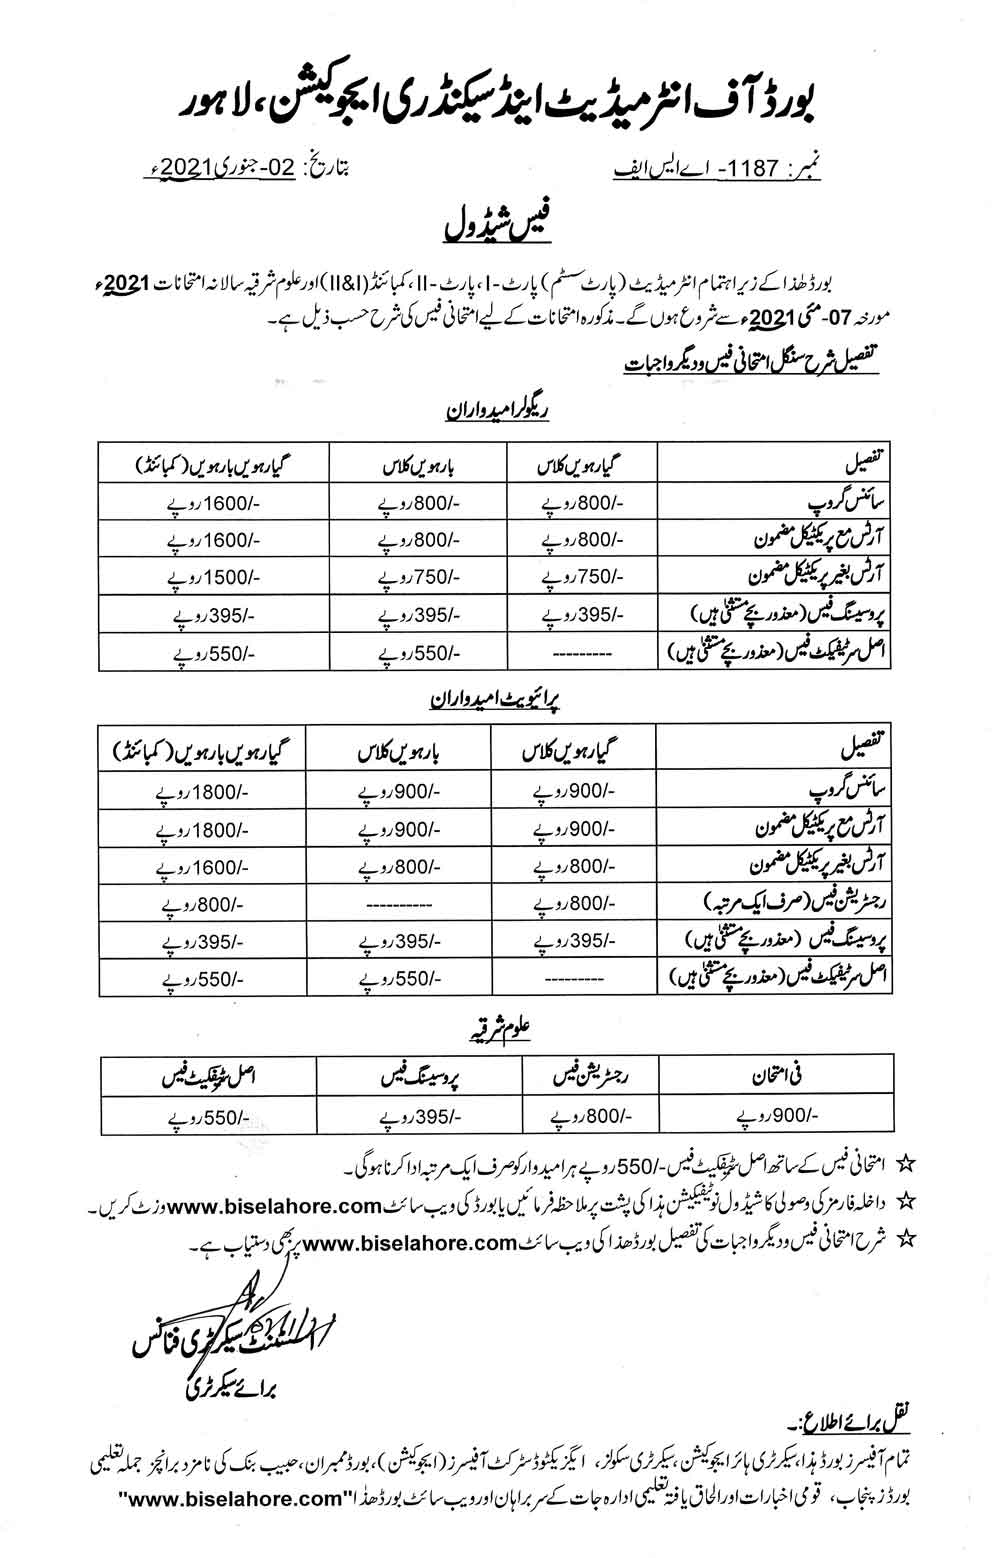 bise-lahore-exam-date-schedule-2021